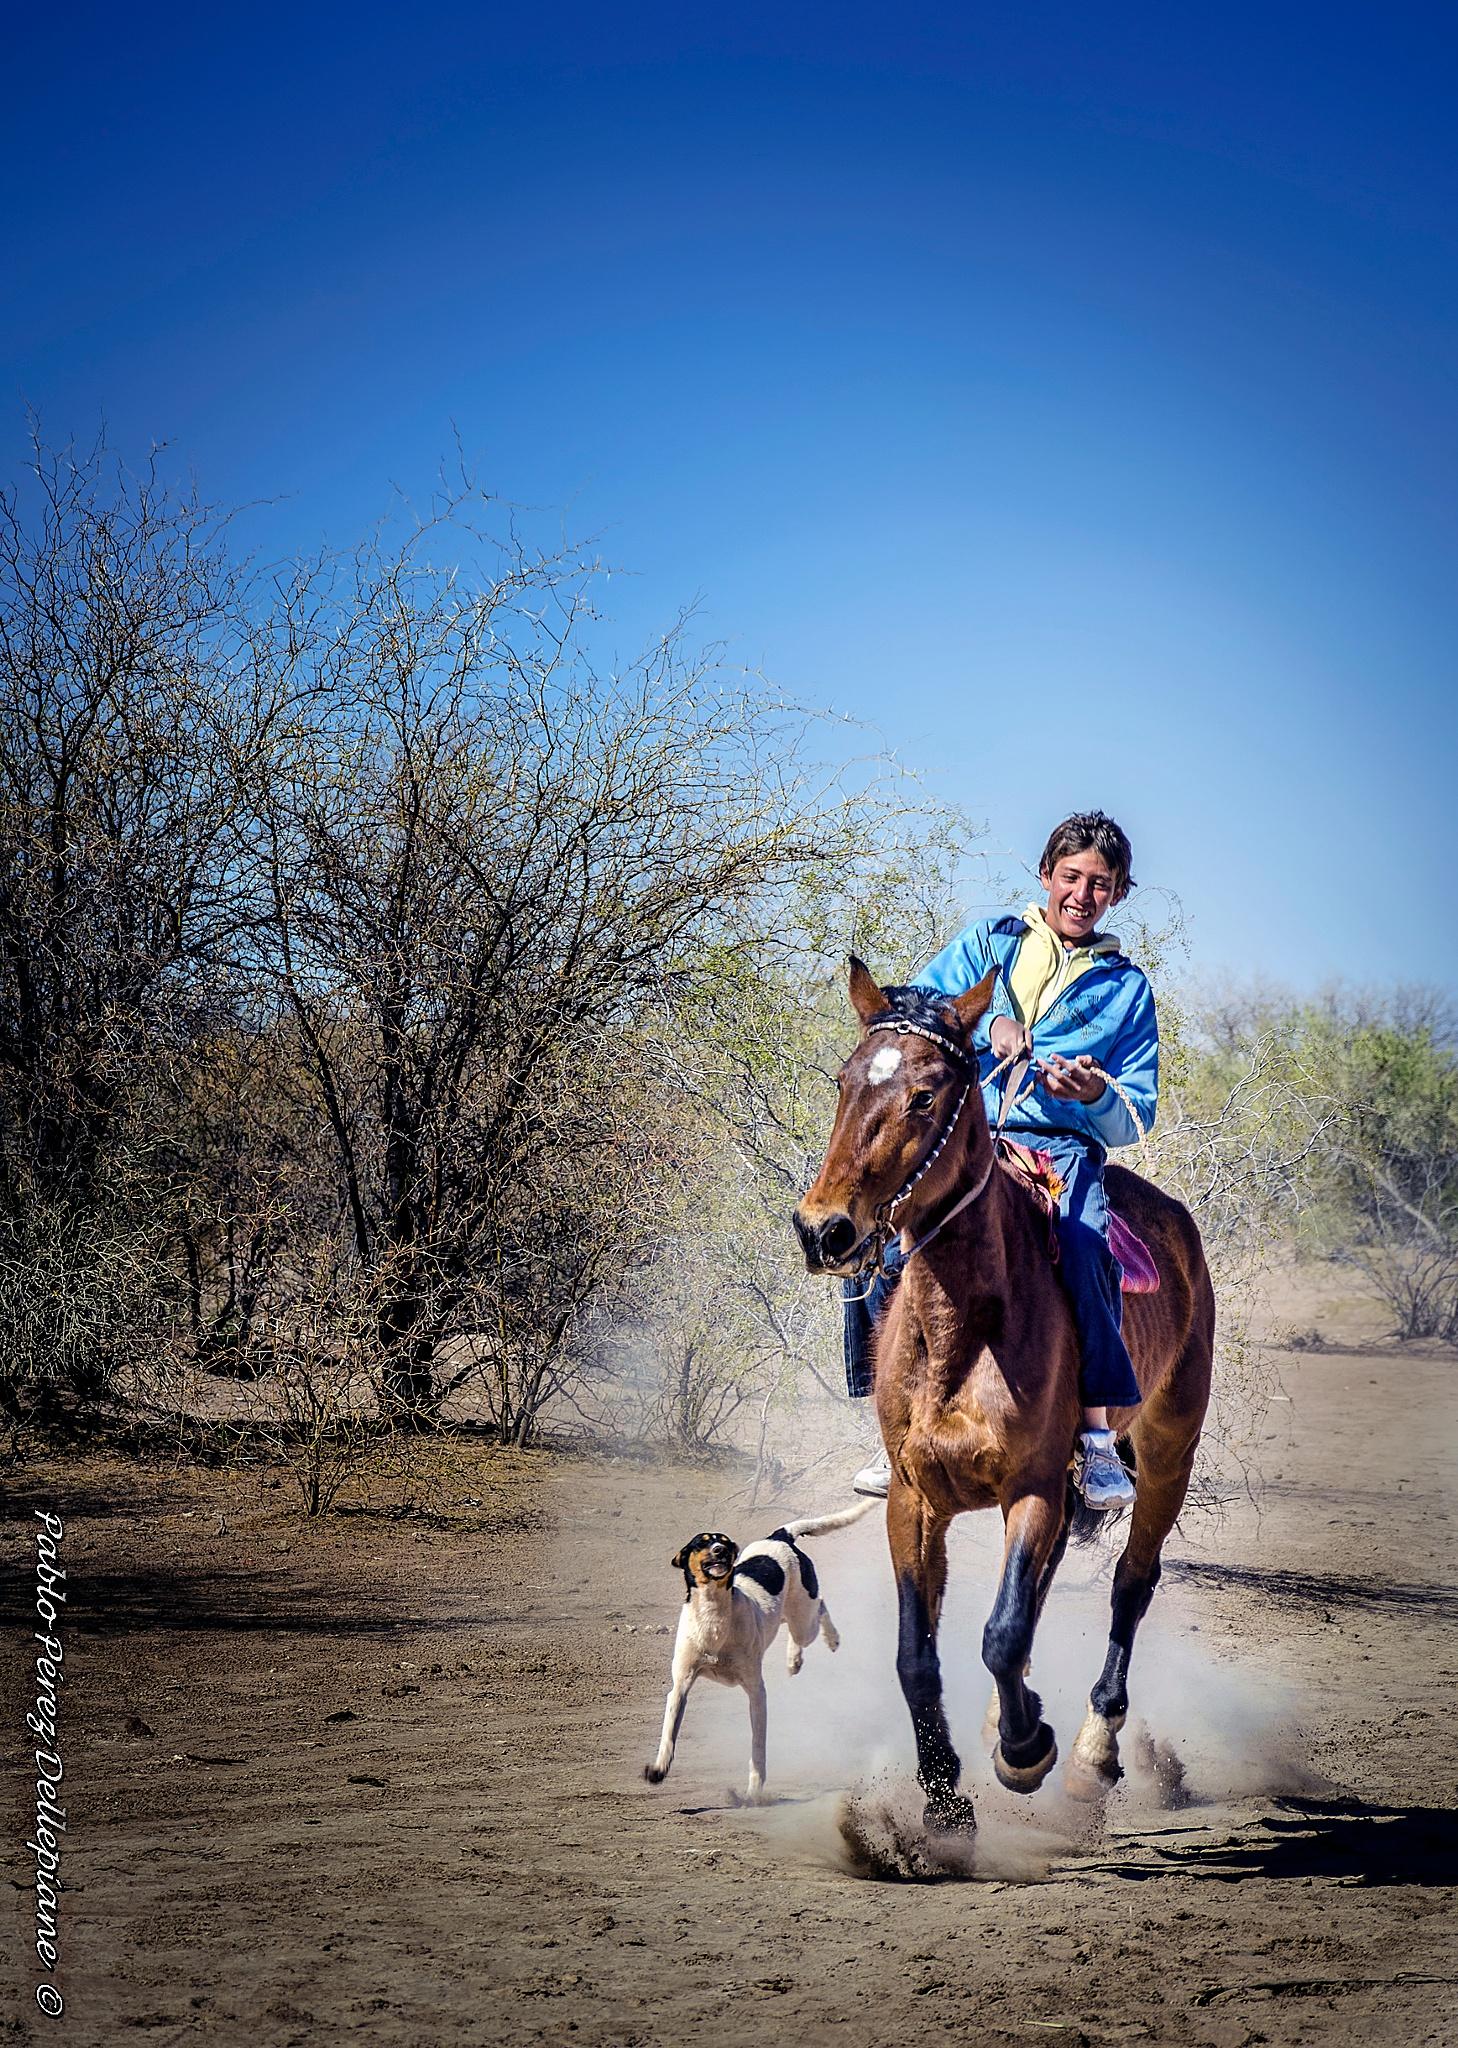 Niño , caballo y perro by PabloPerezDellepiane